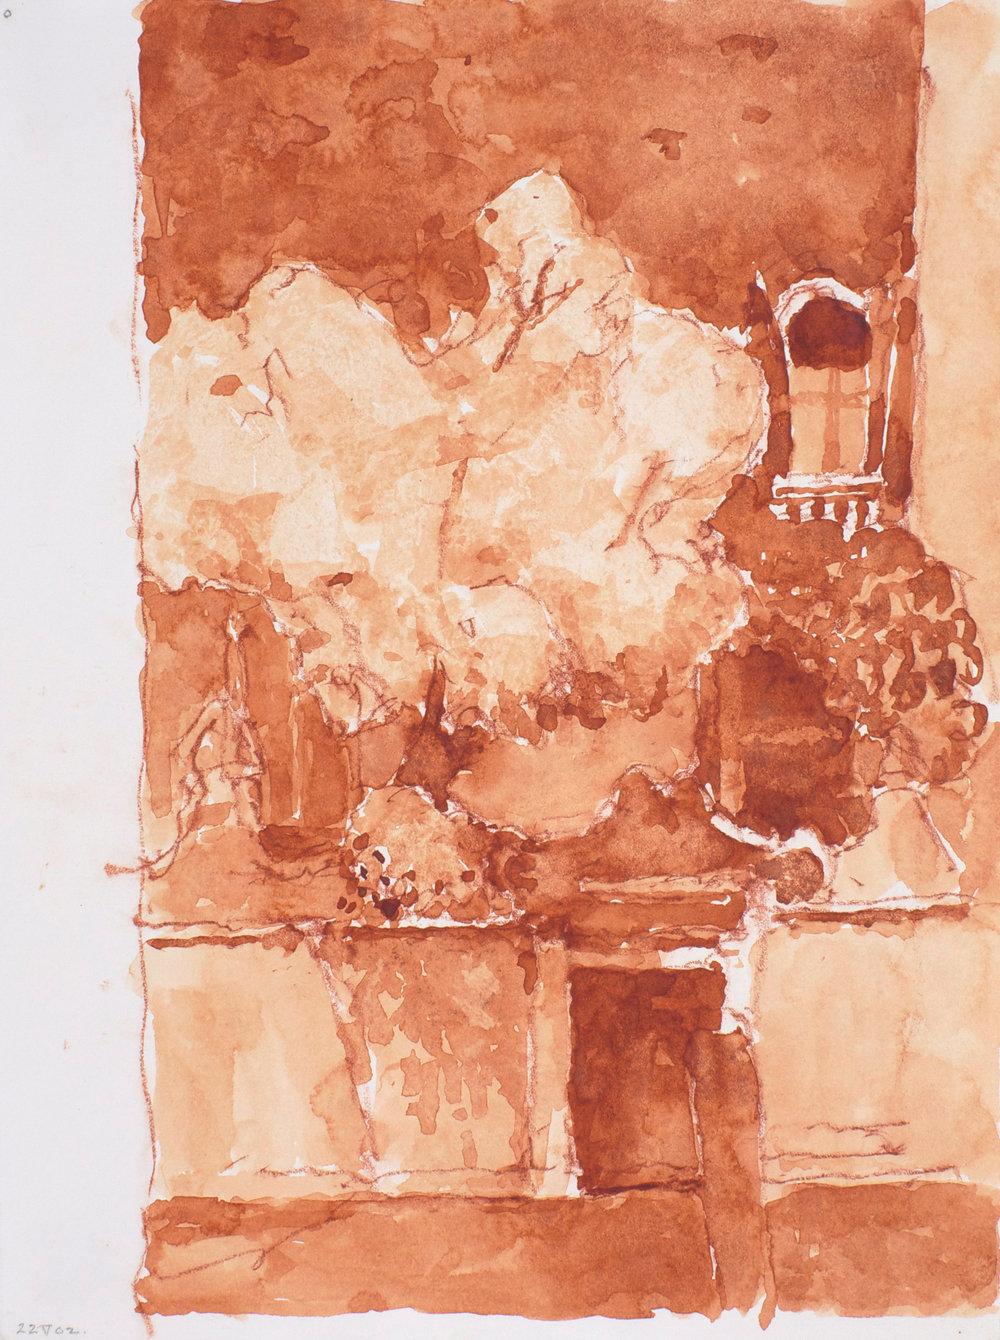 2002_Santa_Ternita_Burnt_Sienna_Santa_Ternita_watercolour_and_red_conte_on_paper_15x11in_38x28cm_WPF335.jpg